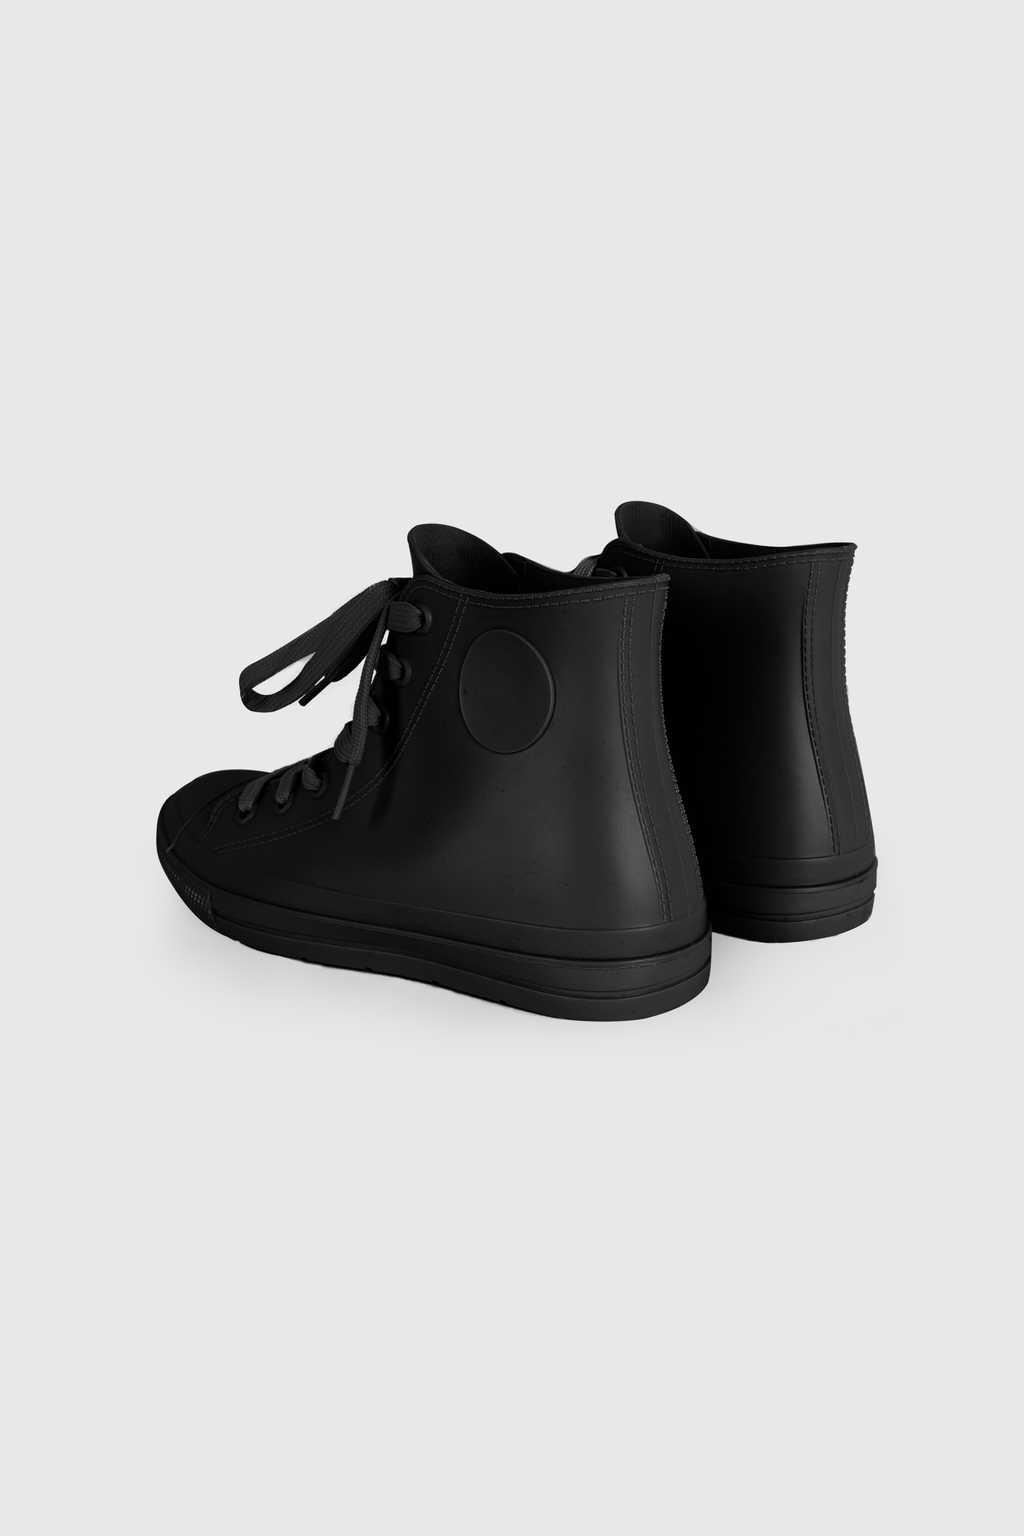 Sneaker 3023 Black 7